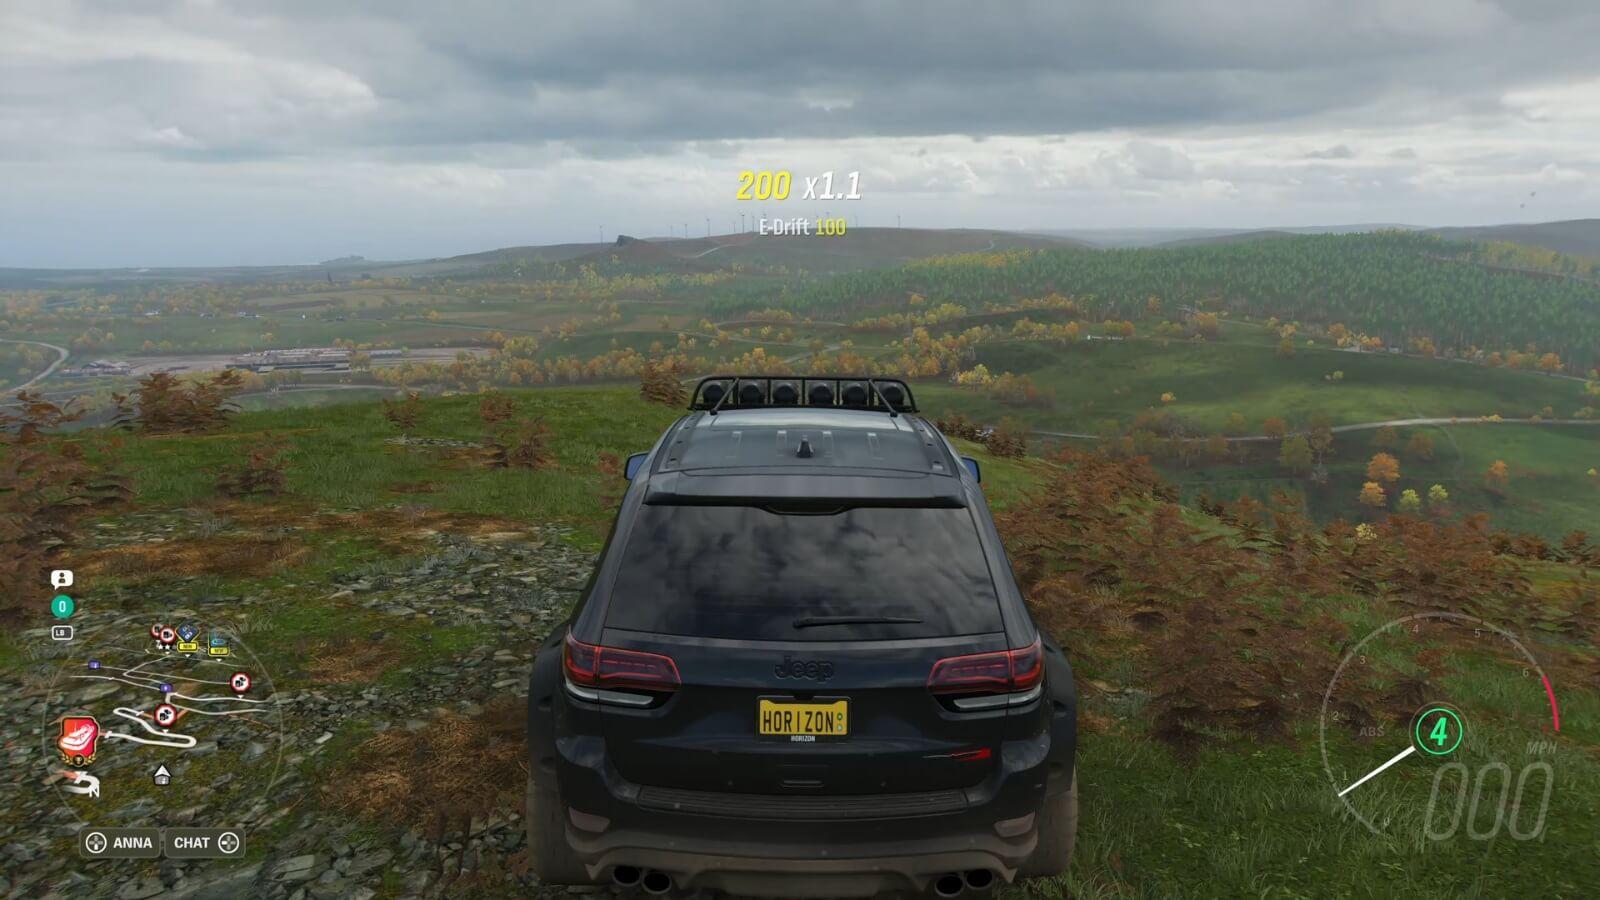 Autumn Falls Upon Britain in Forza Horizon 4's Second